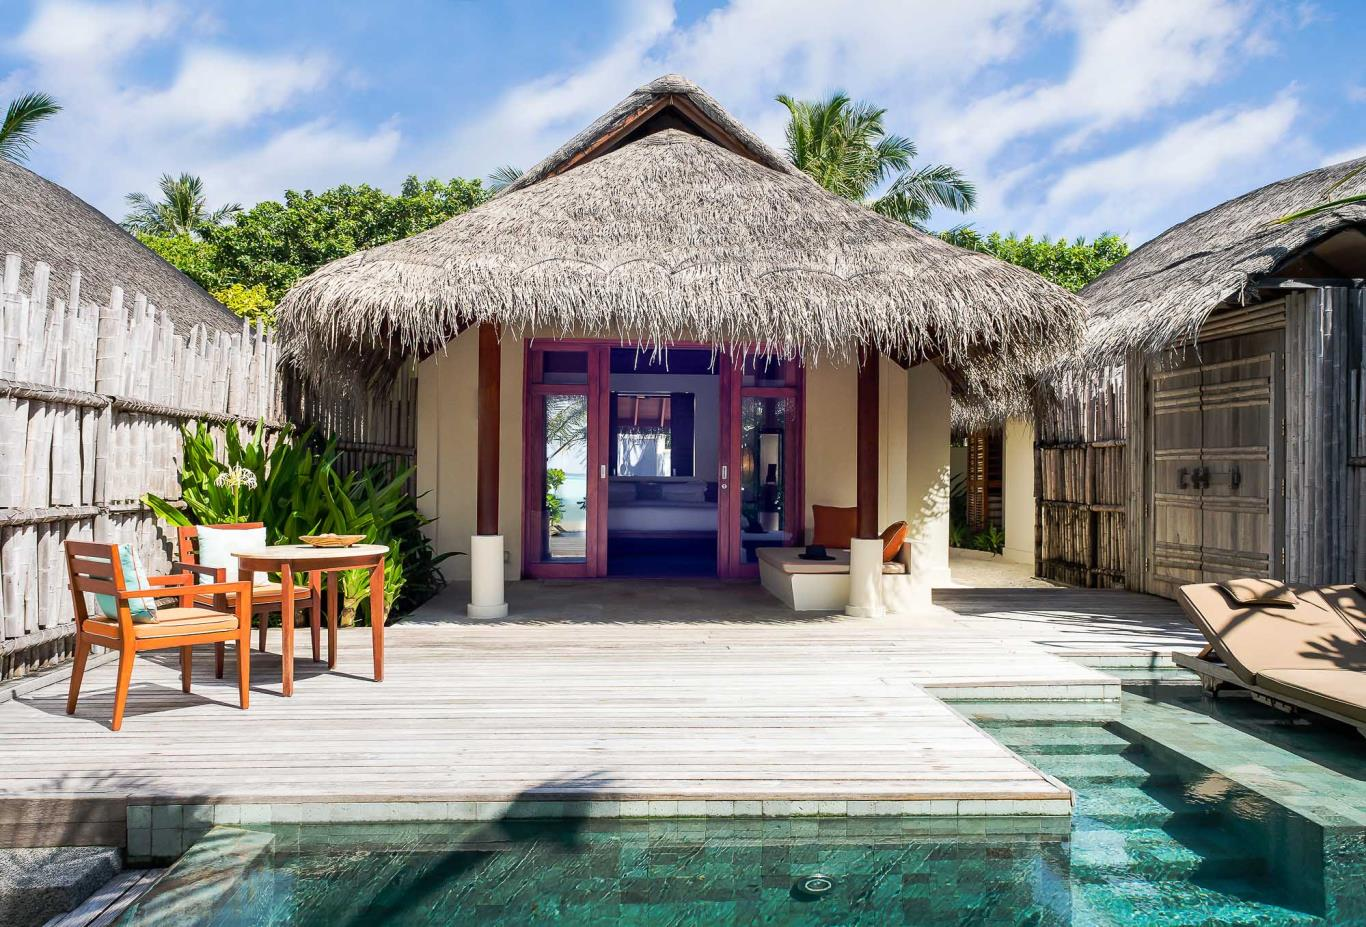 Anantara Pool Villa pool deck